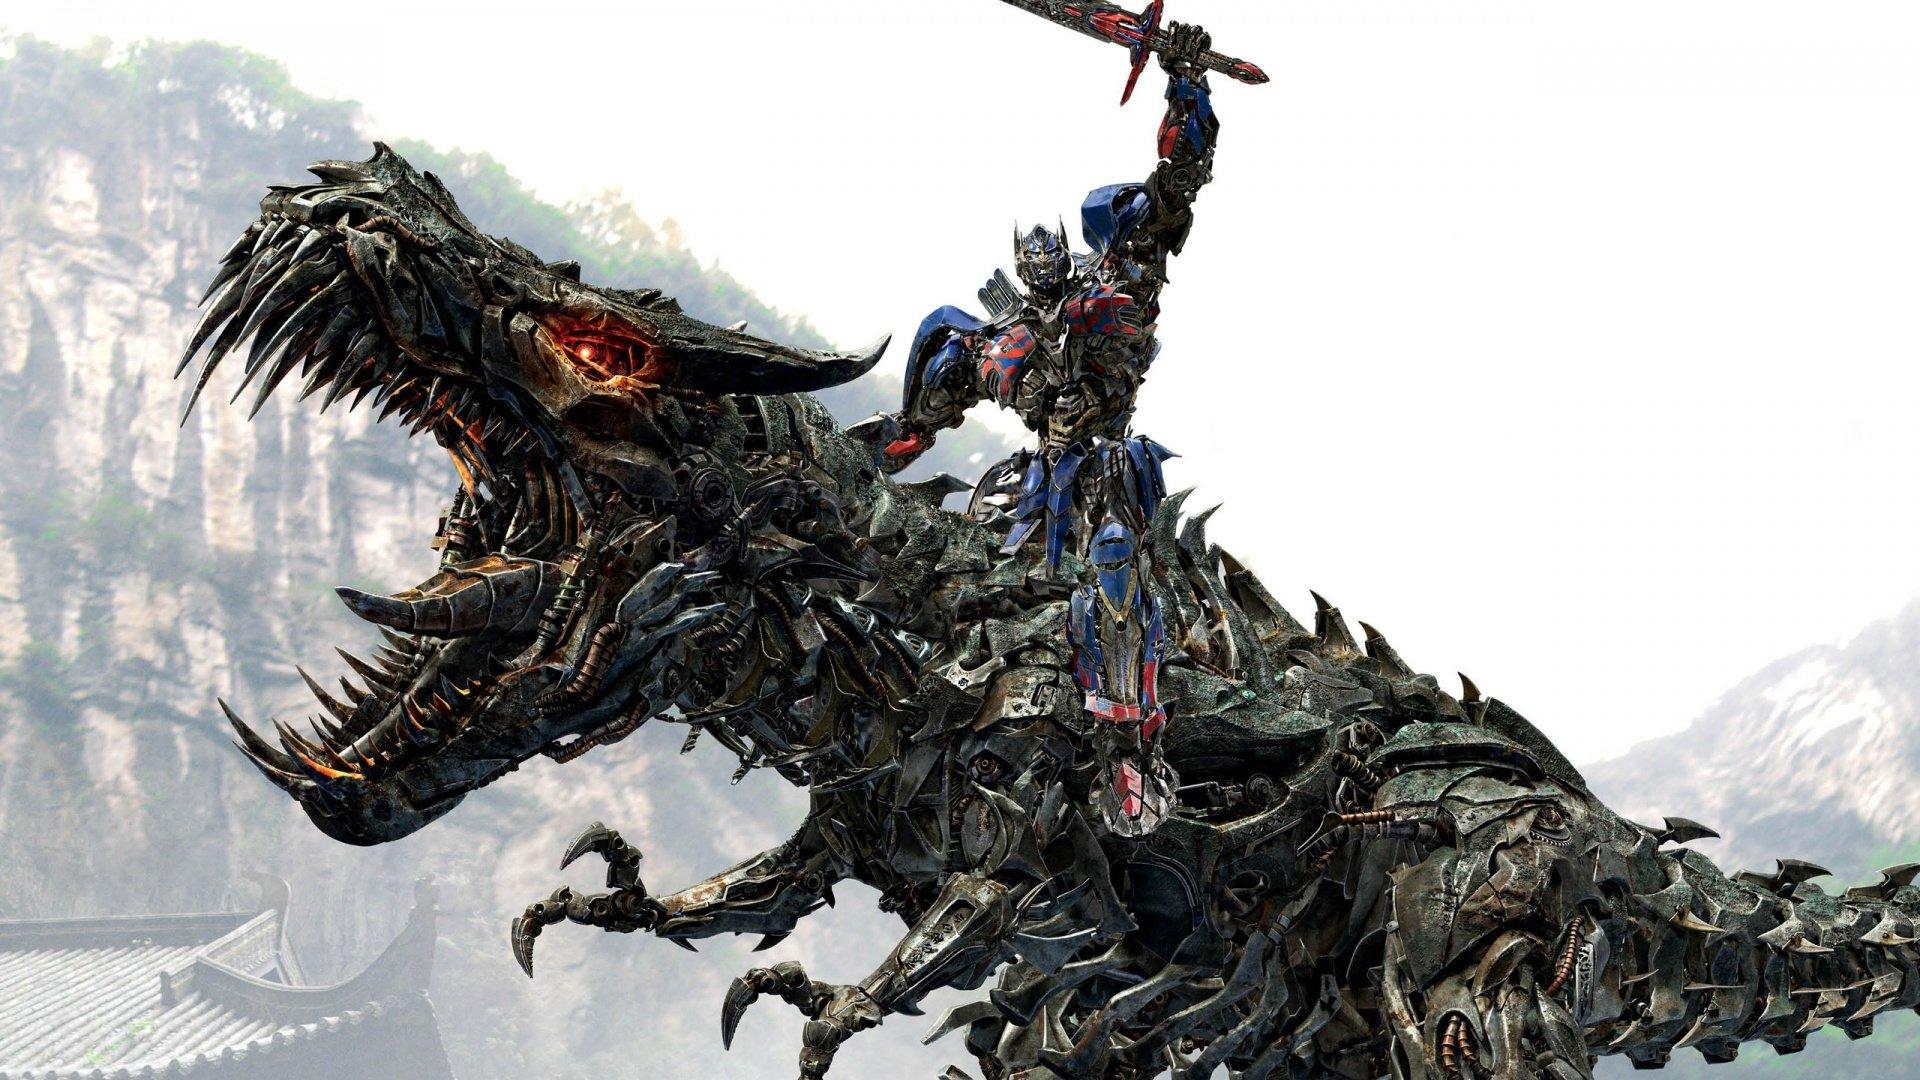 Movie - Transformers: Age of Extinction  Optimus Prime Dragon Robot Wallpaper